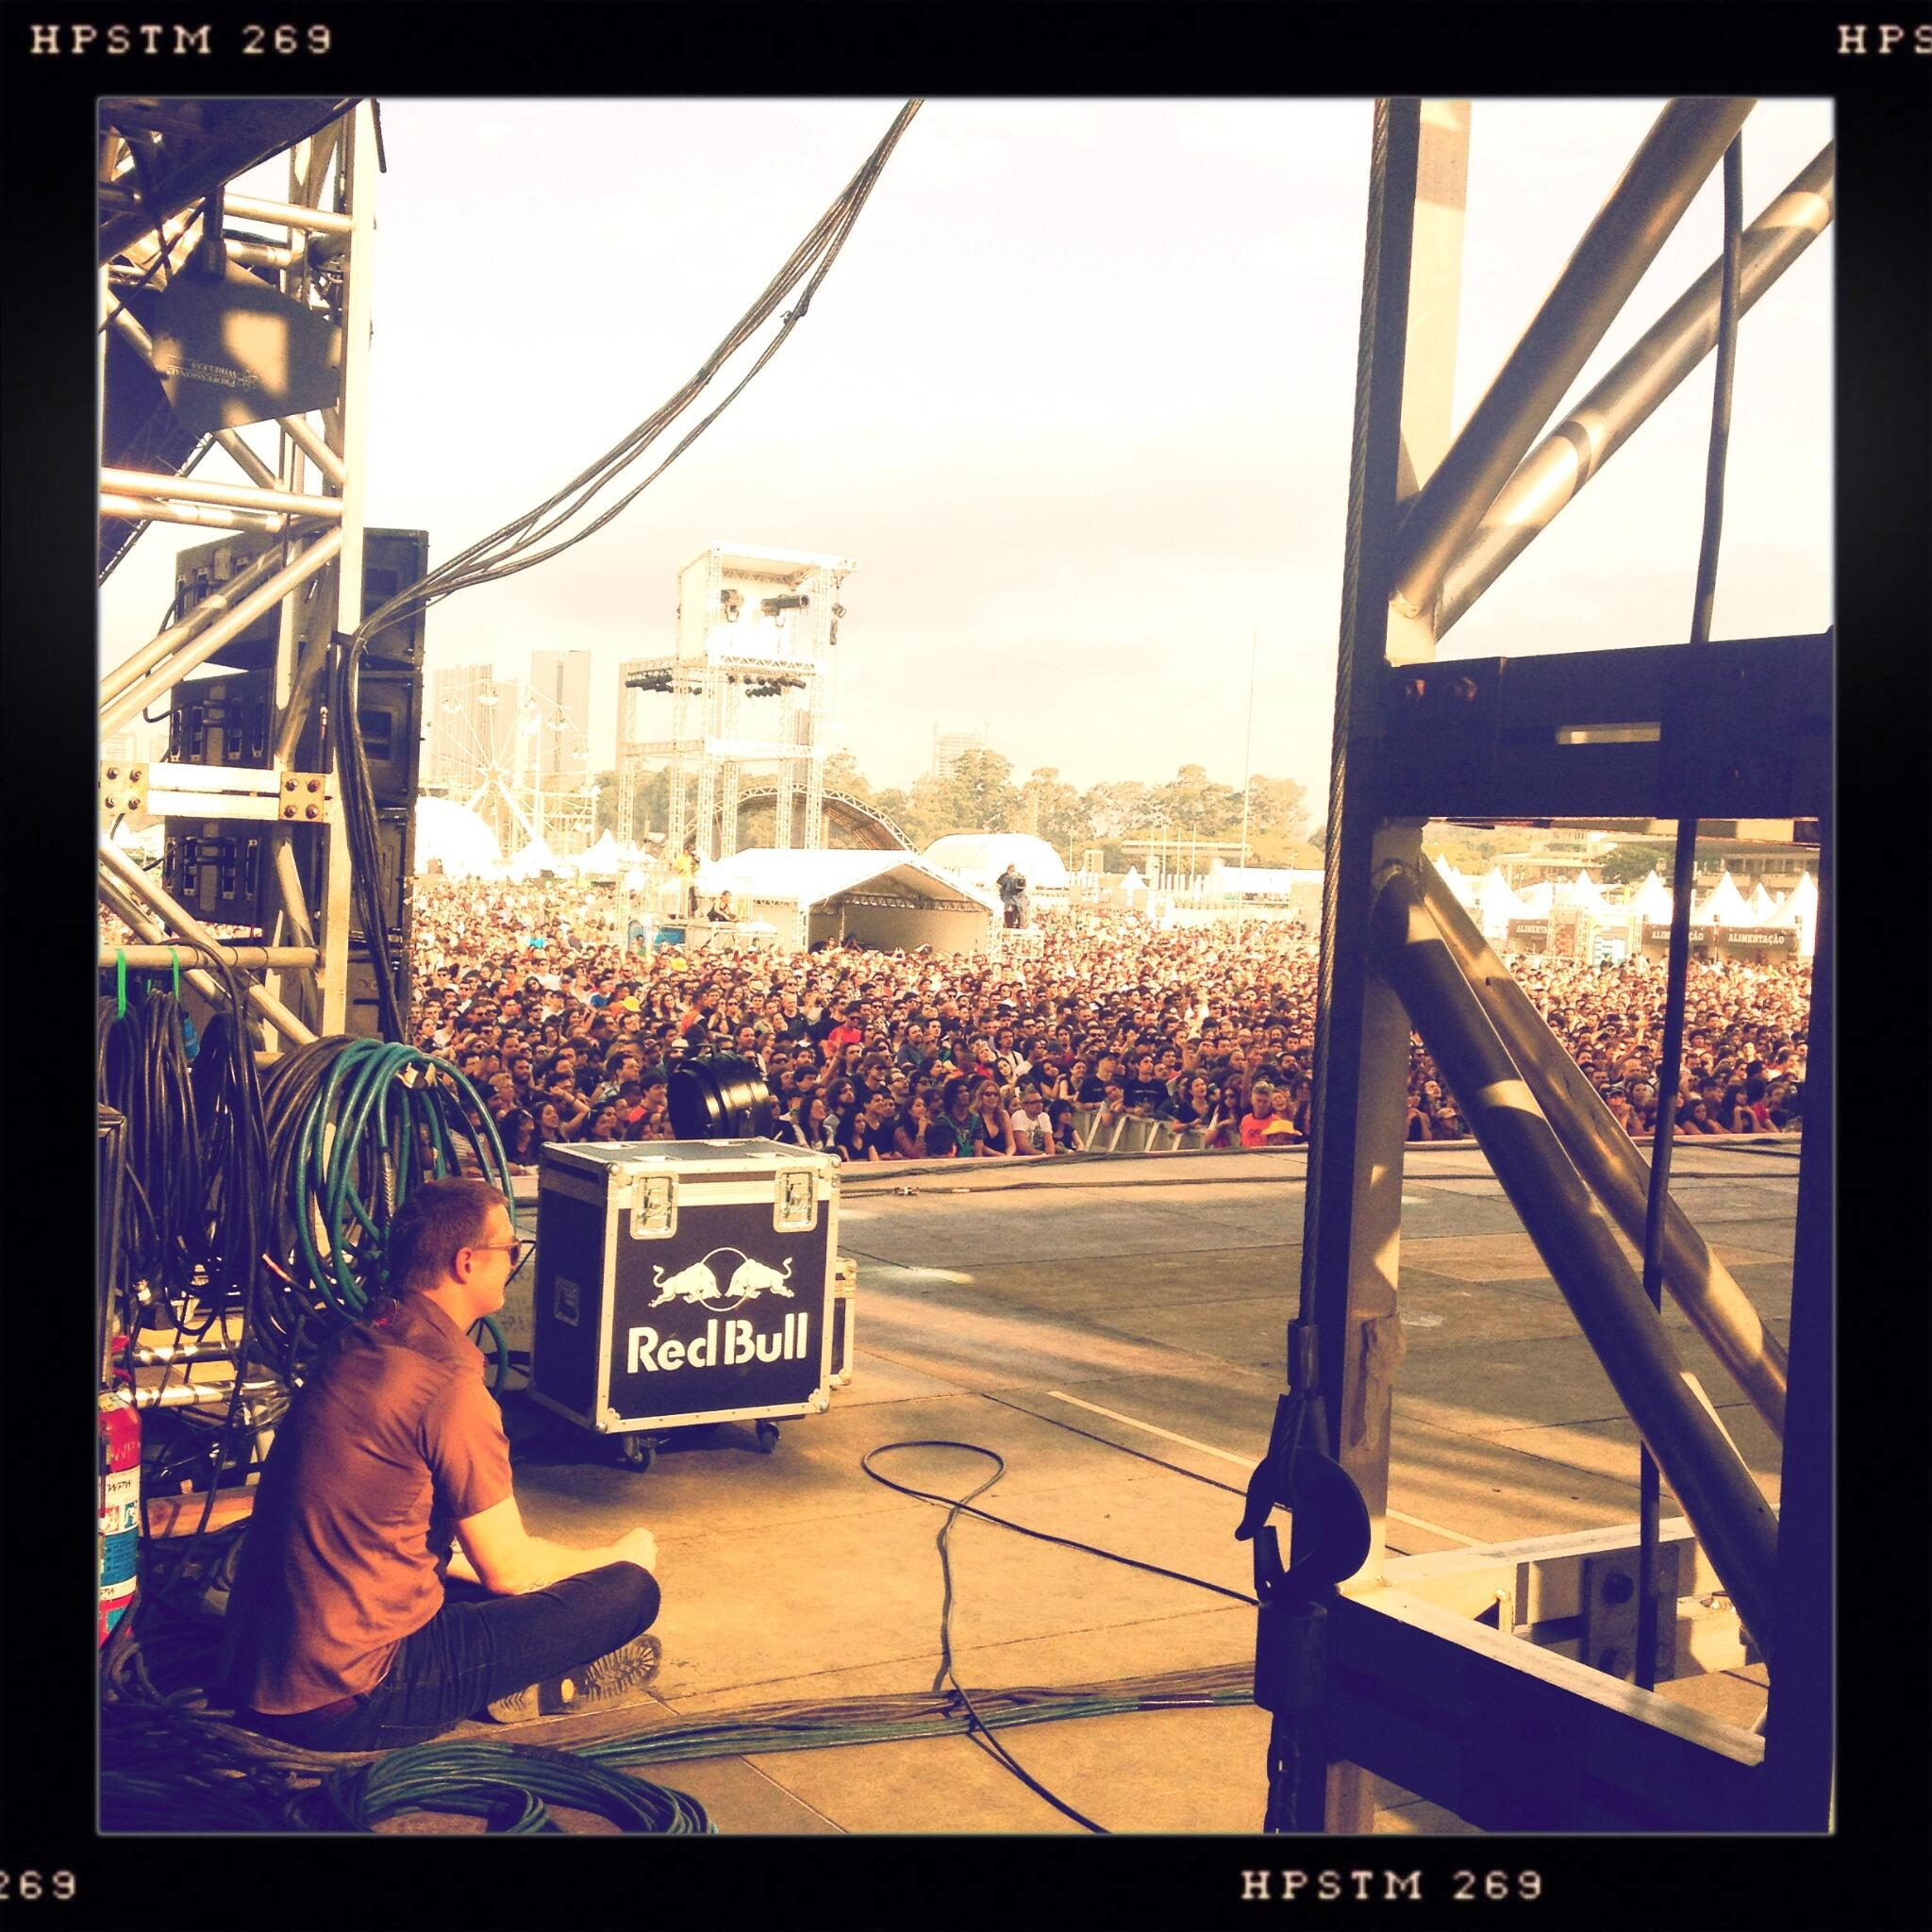 Lollapalooza Brasil 2013 streaming [PEARL JAM, THE BLACK KEYS, QOTSA, A PERFECT CIRCLE, ...] BGoZZuECUAAu8sT